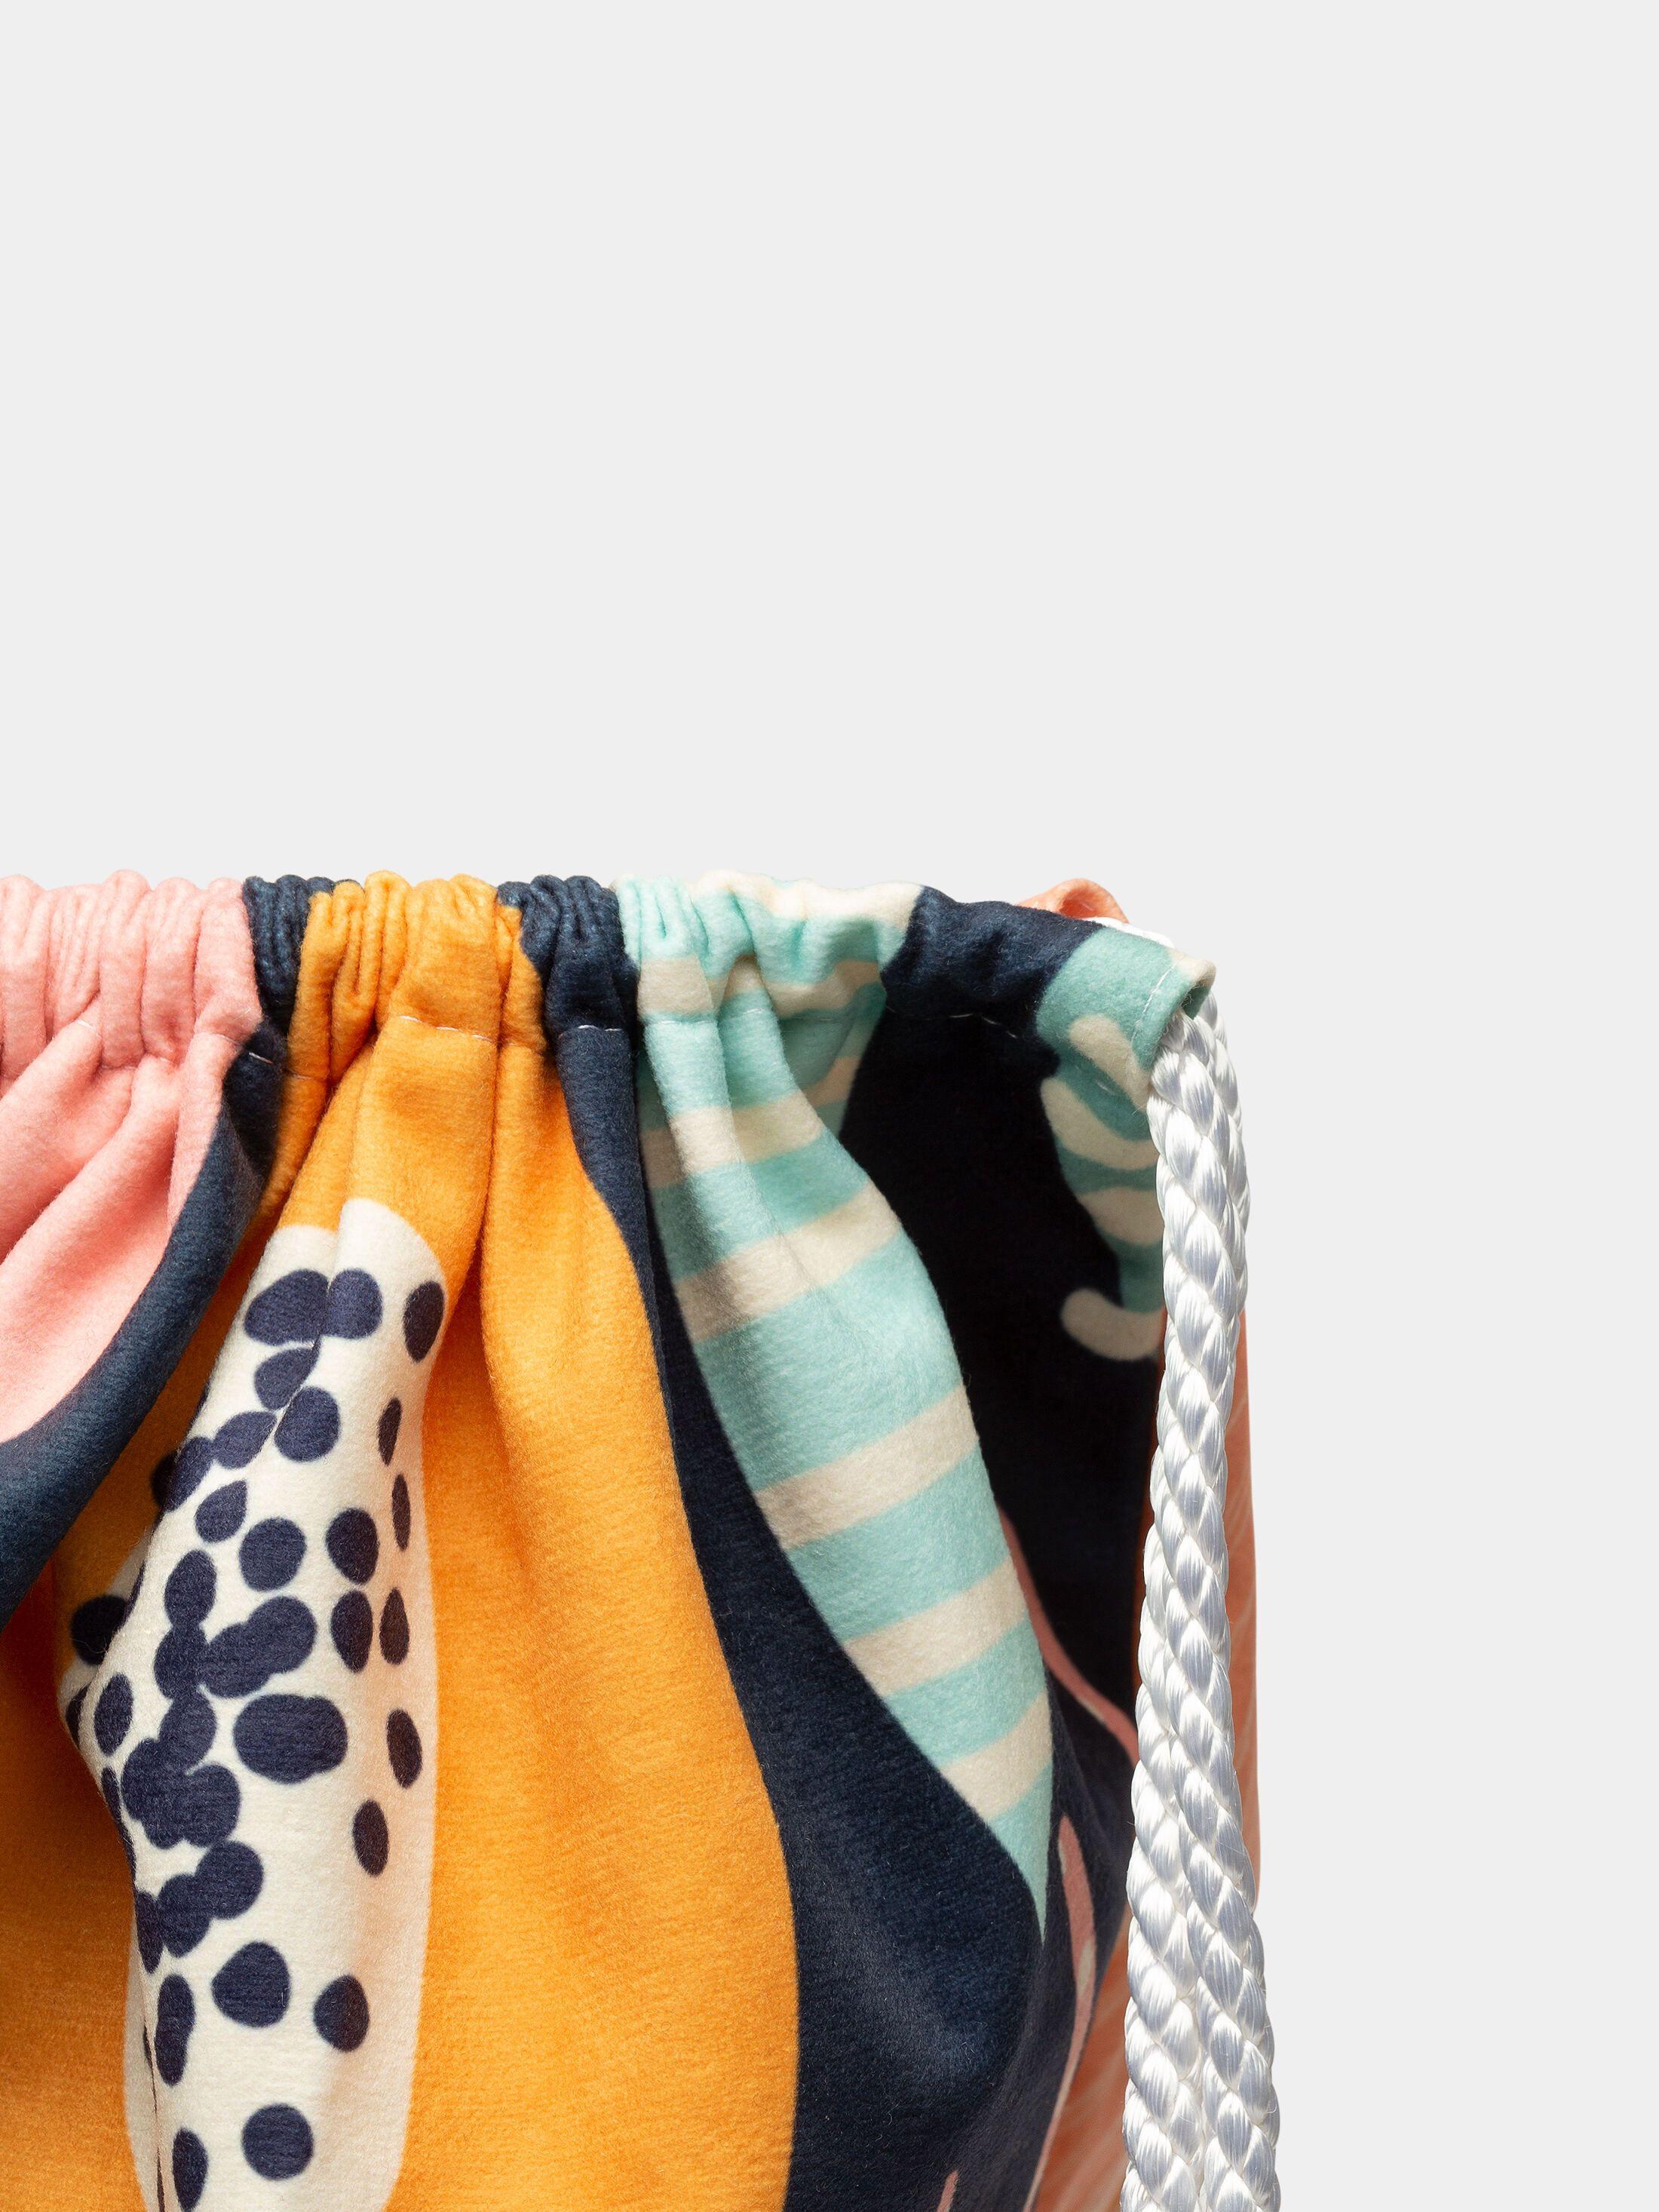 Custom Laundry Bags Ireland